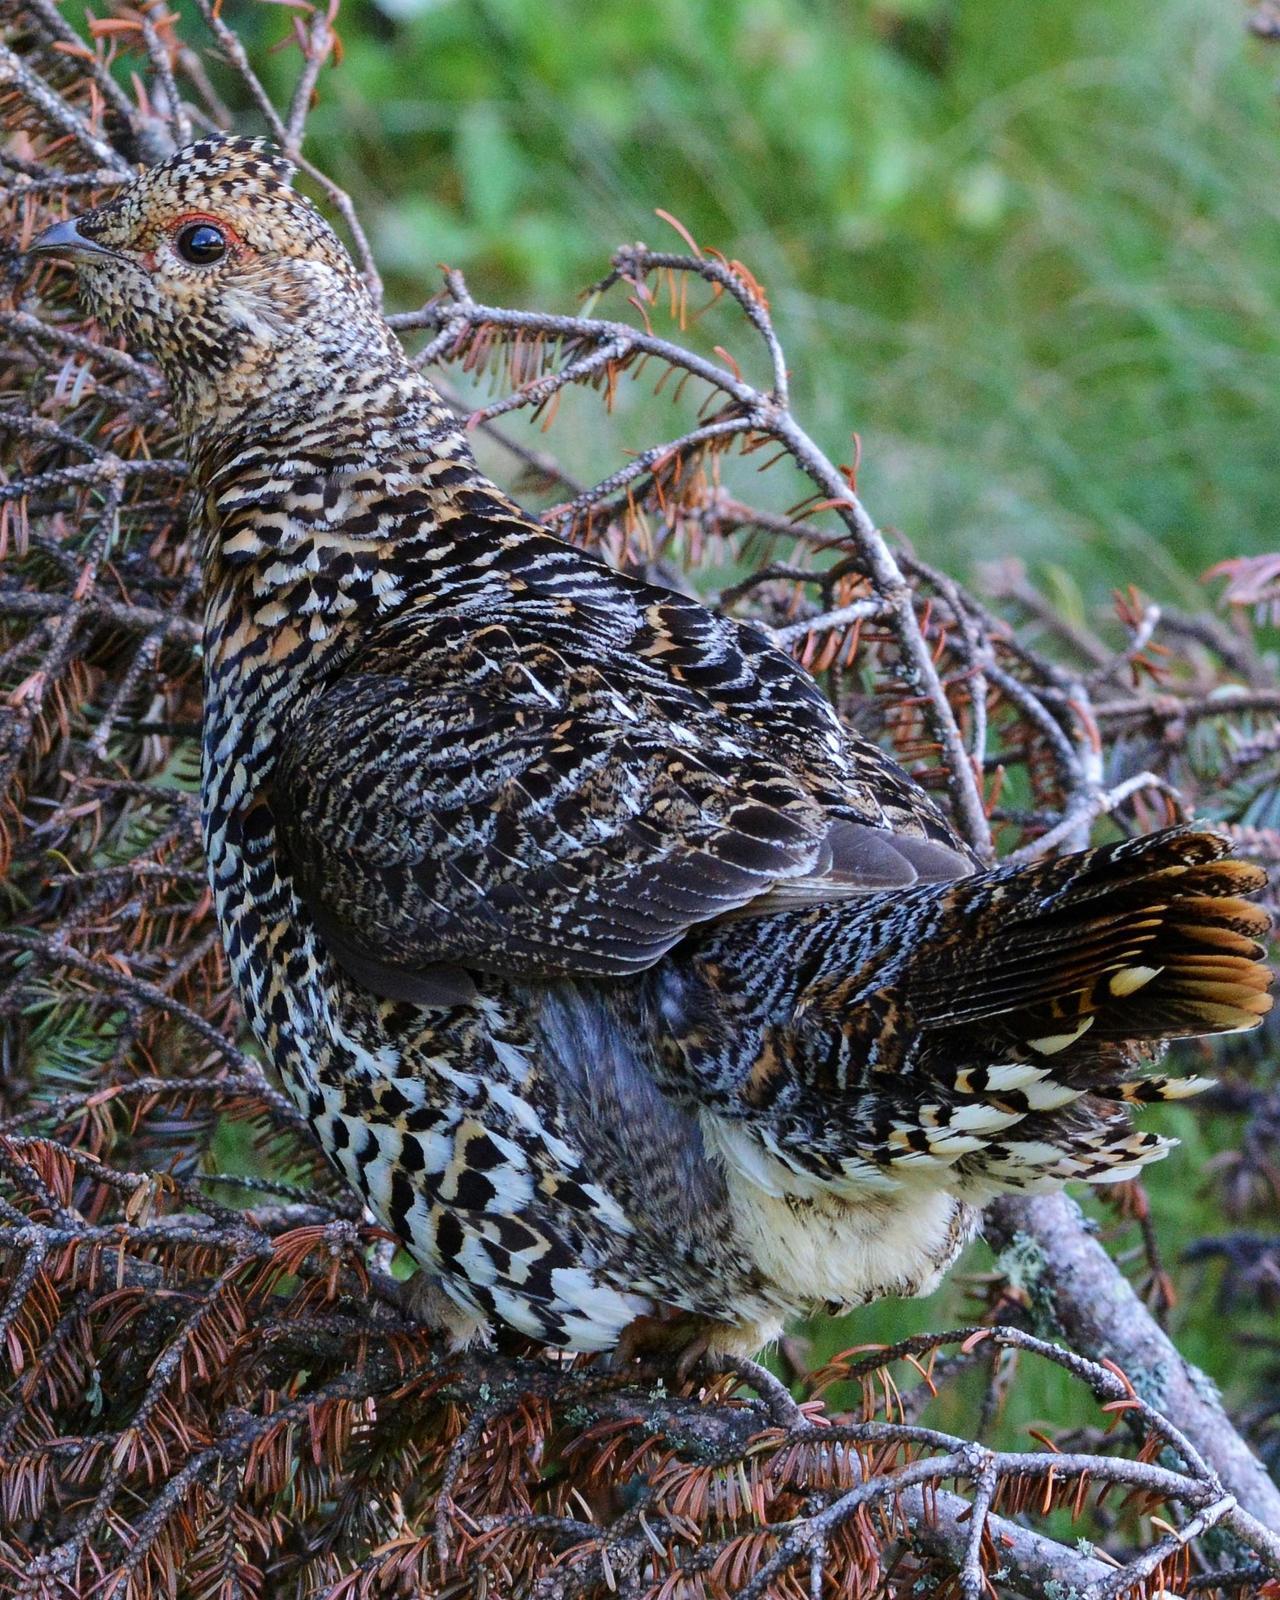 Spruce Grouse Photo by David Hollie